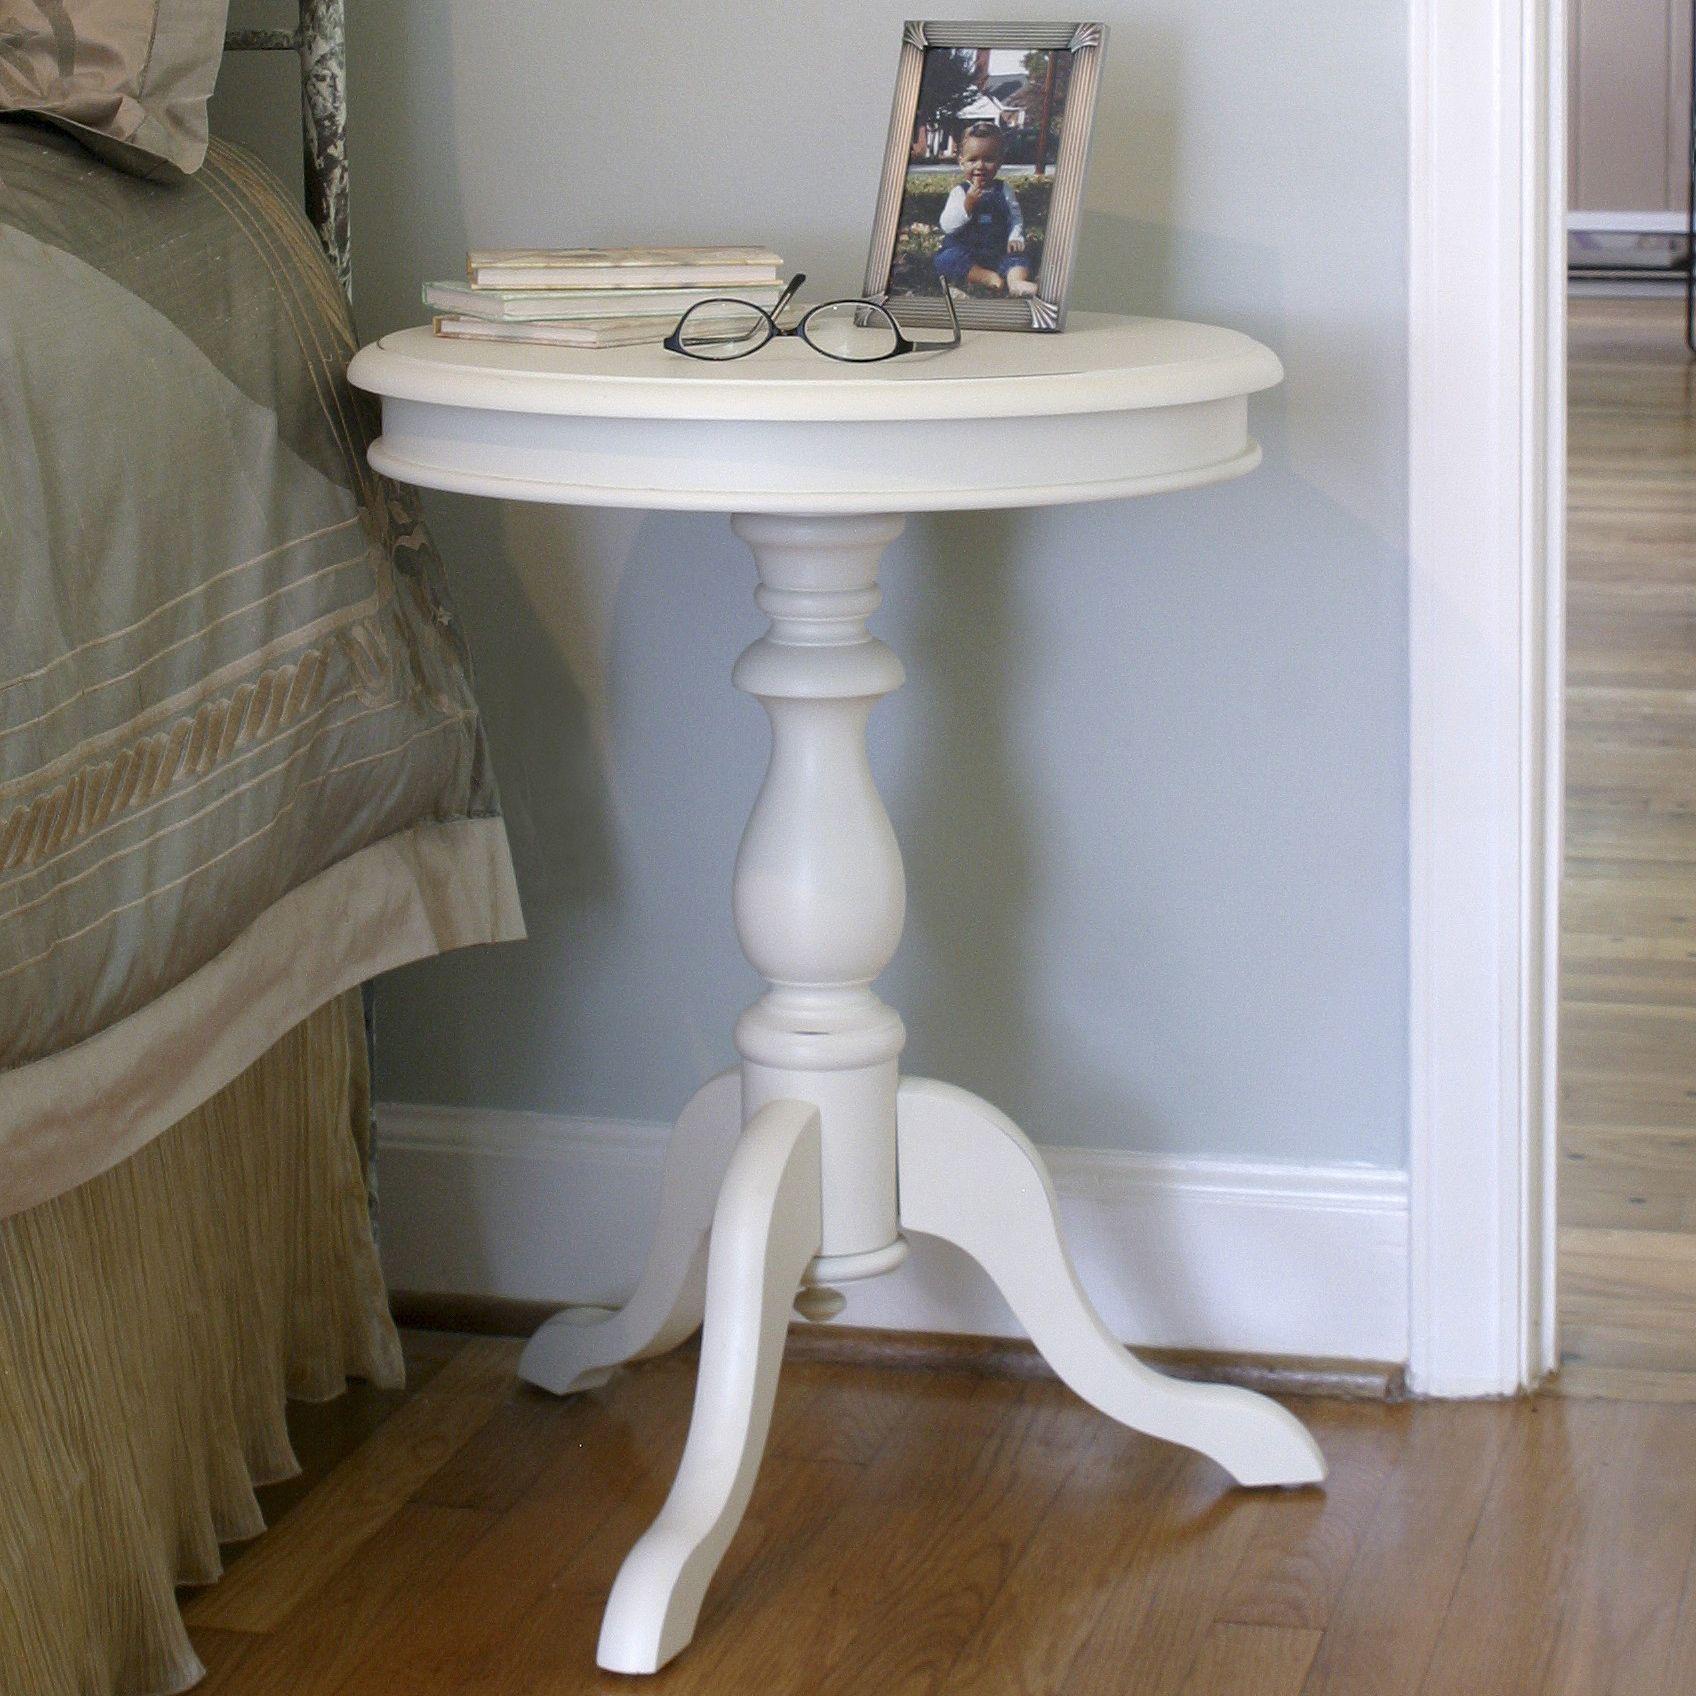 Elegant Pedestal And Vibrant Ivory Finish